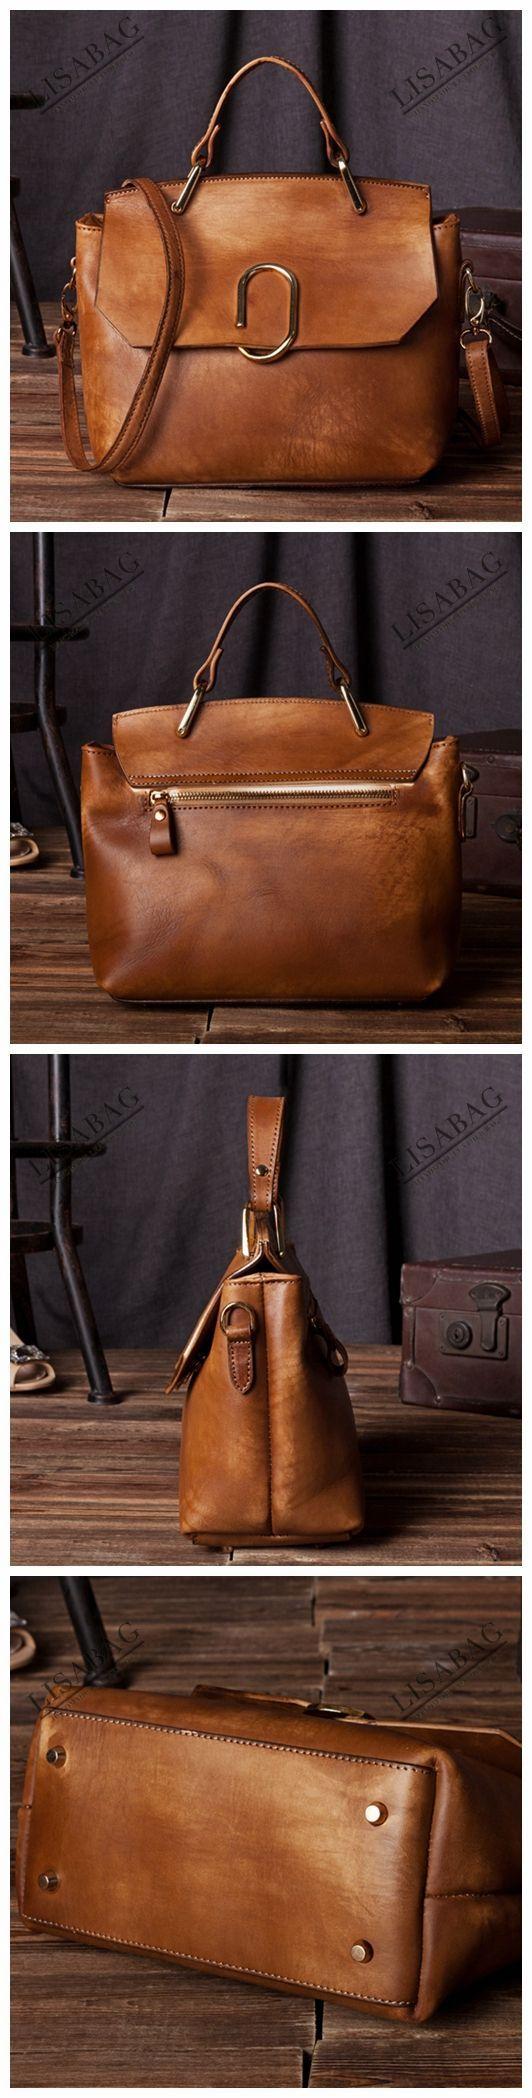 Handcrafted Women's Fashion Leather Handbag Messenger Bag Small Satchel in Vintage Brown C205--LISABAG #Fashion